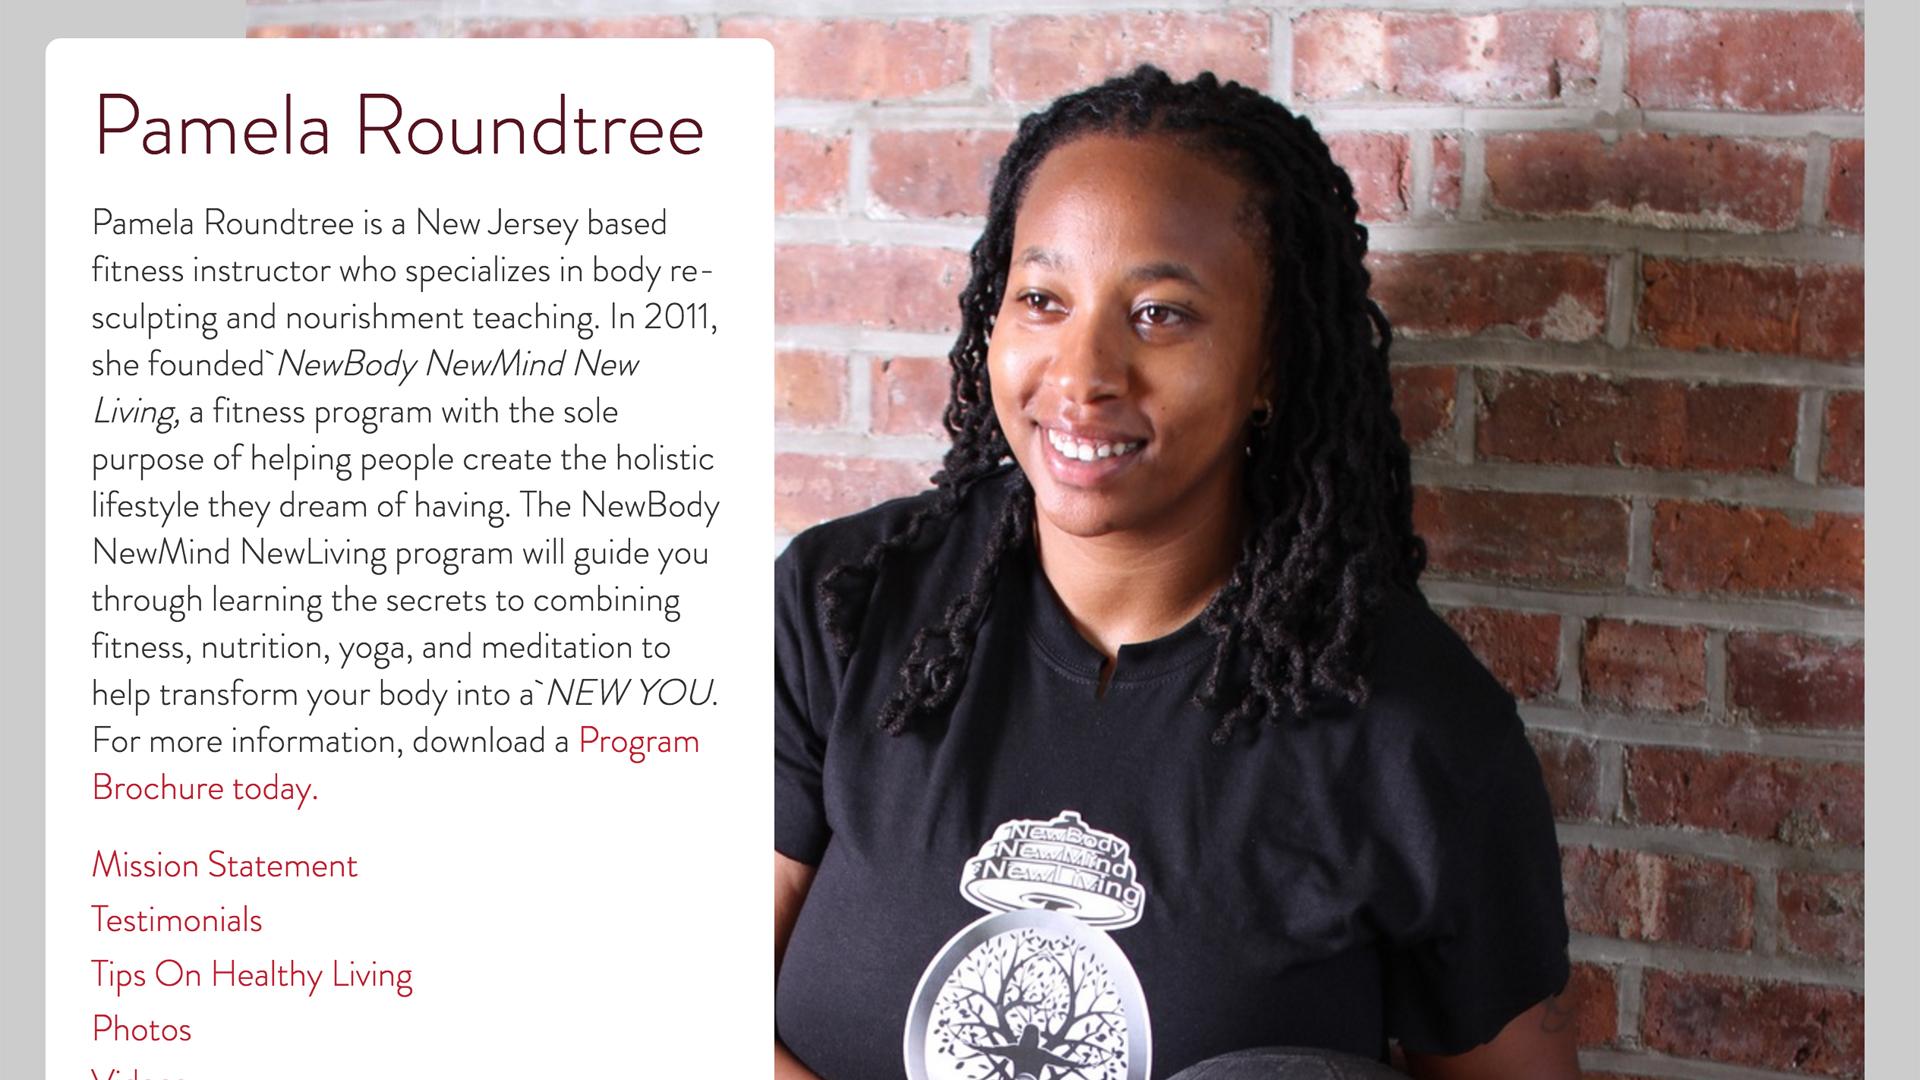 Pamela Roundtree, NewBody.NewMind.NewLiving